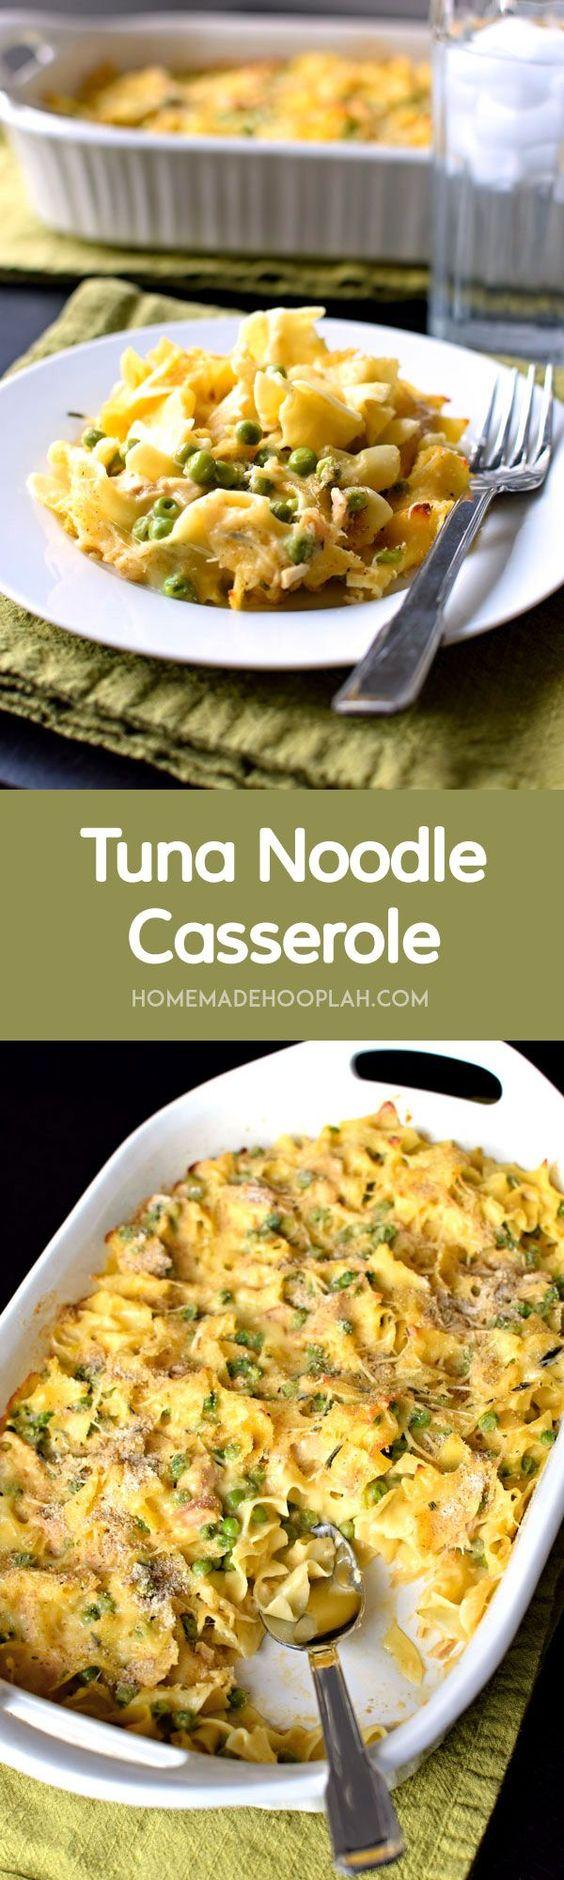 Tuna Noodle Casserole! Creamy cheesy sauce with tuna ...